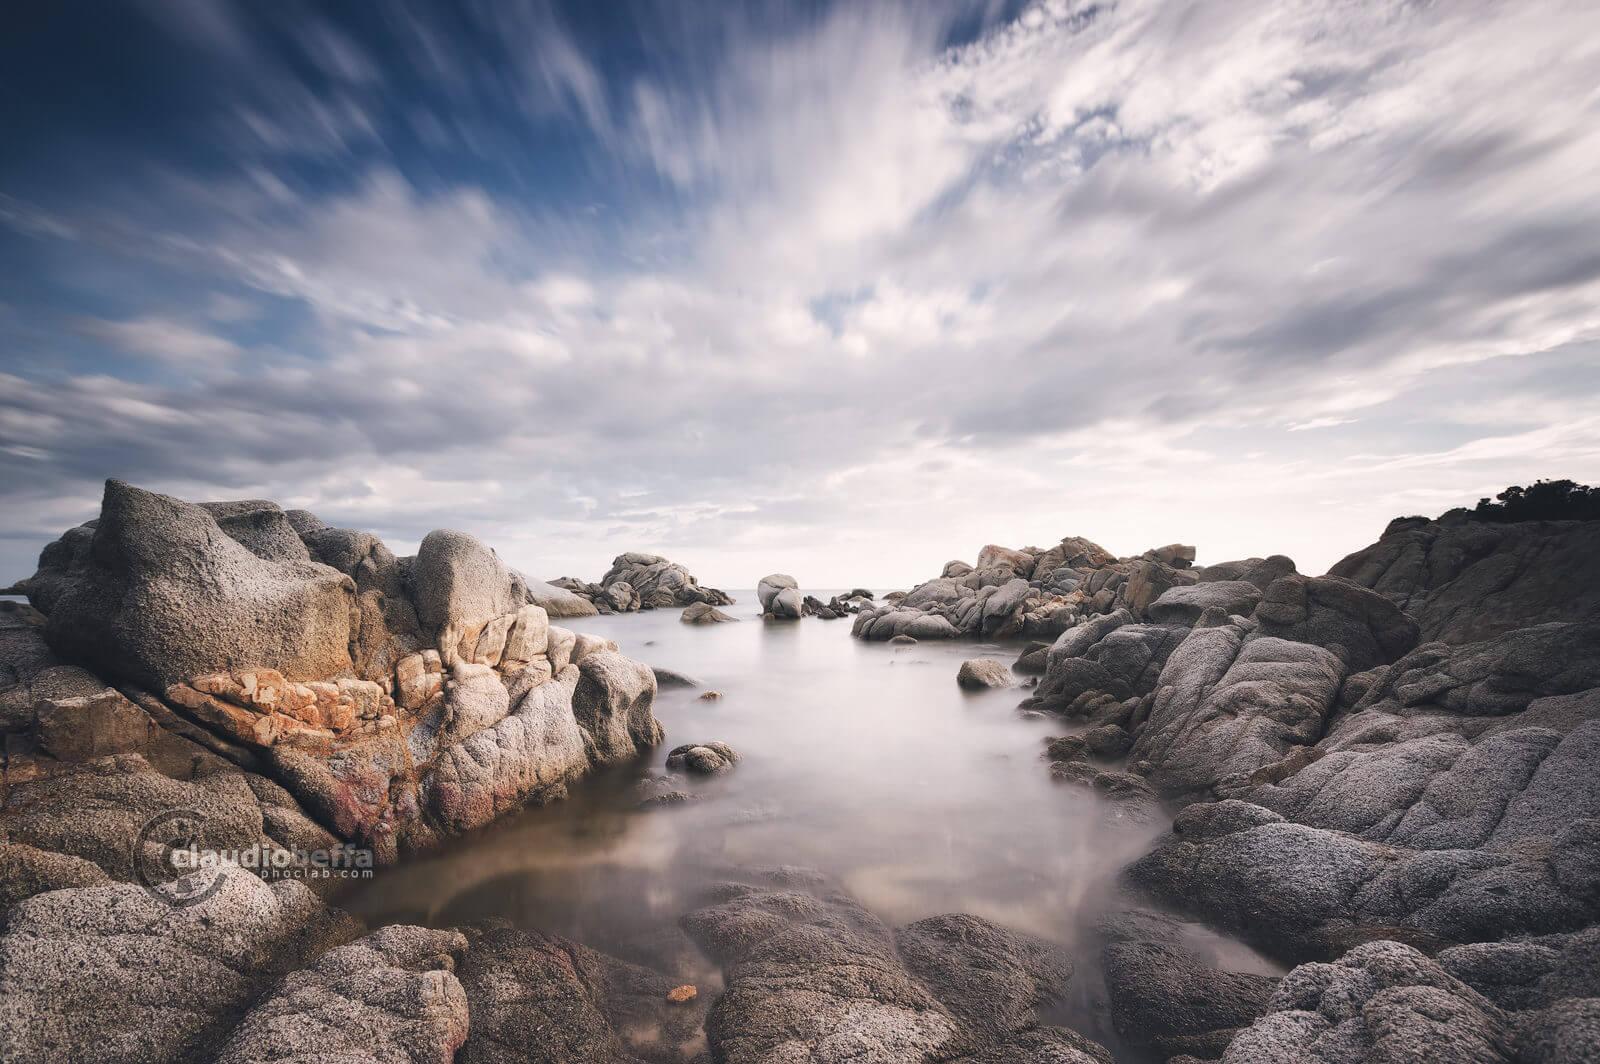 blunted teeth, rocks, cove, sea, water, sky, clouds, long exposure, sardinia, italy